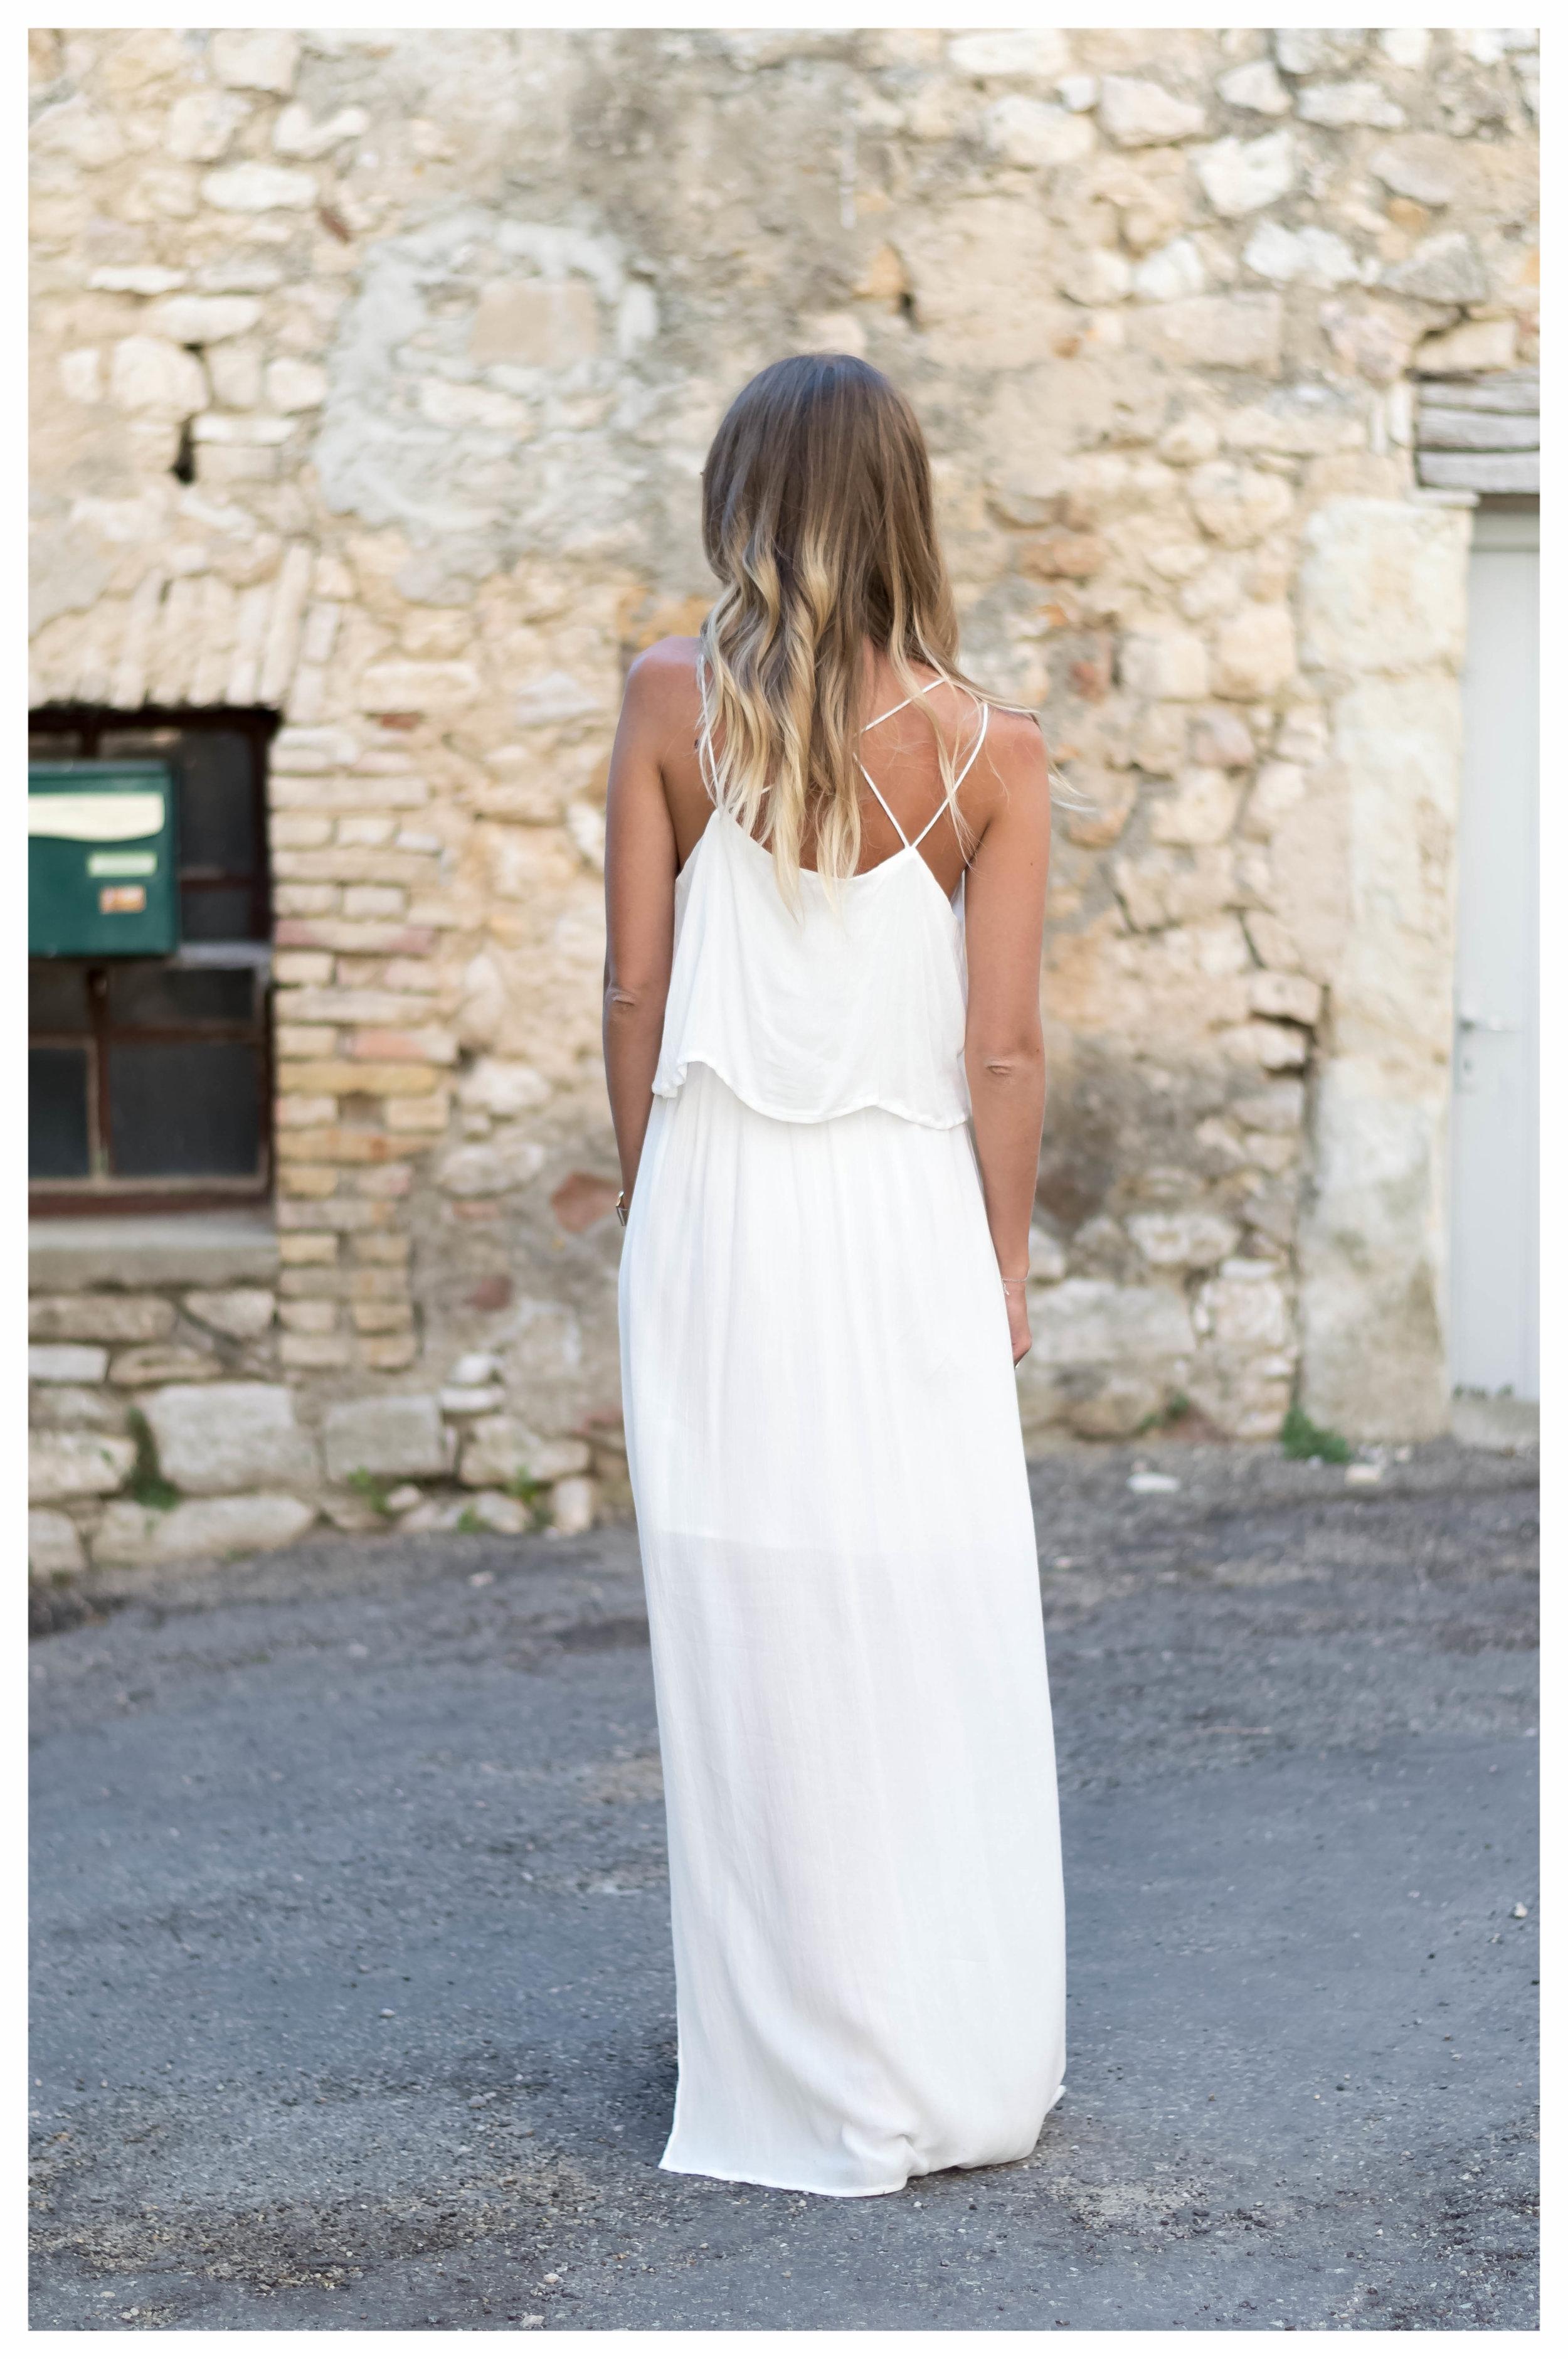 White Dress - OSIARAH.COM (9 sur 16).jpg